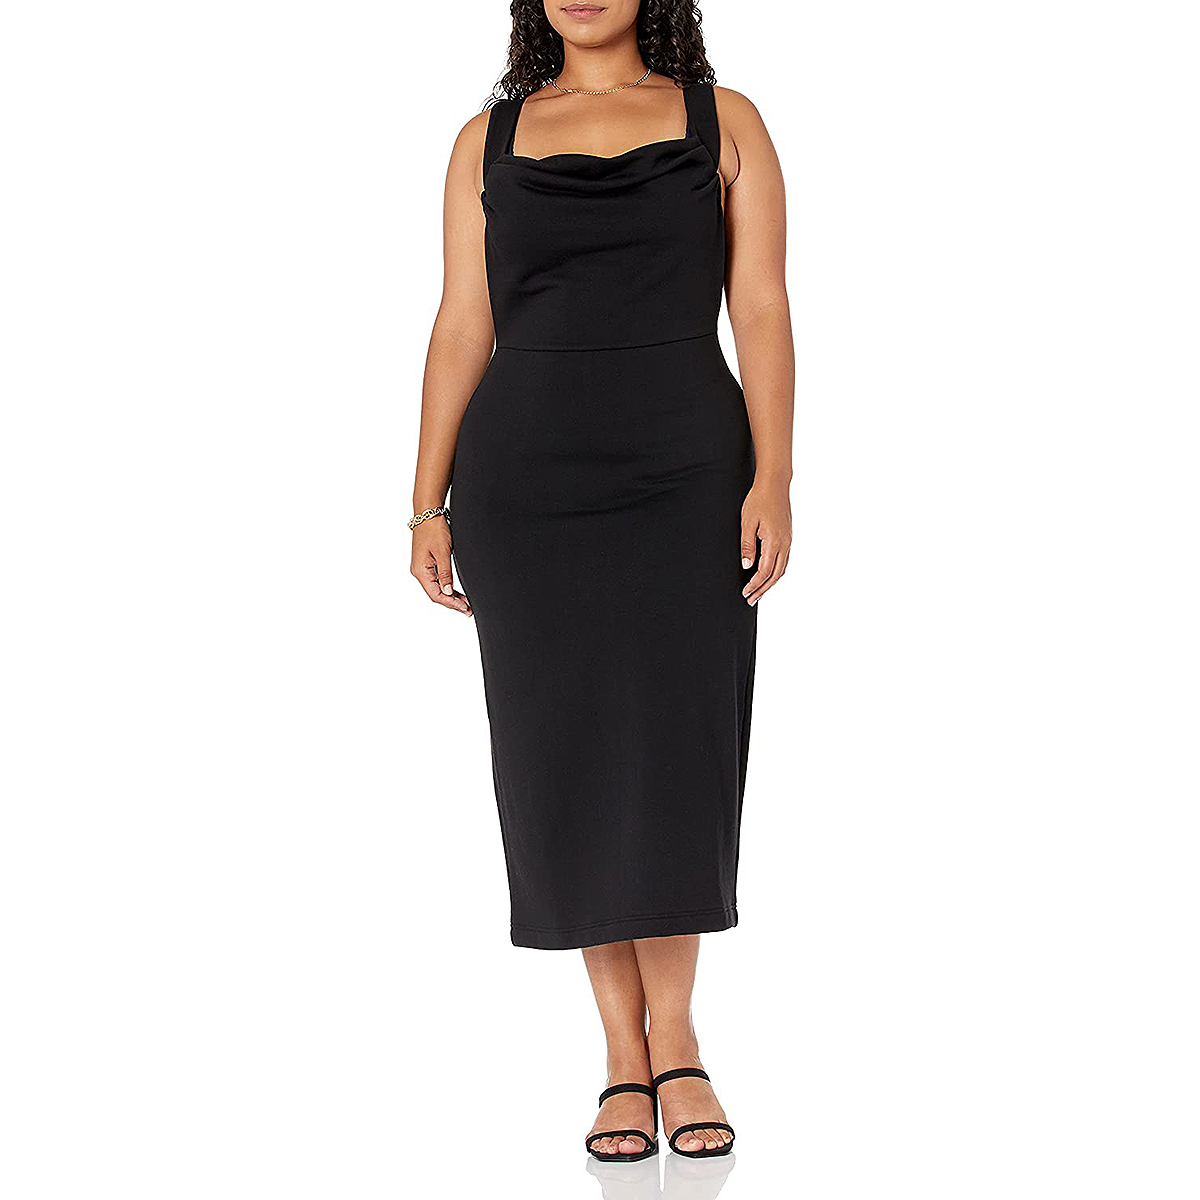 making-the-cut-amazon-andreas-black-dress